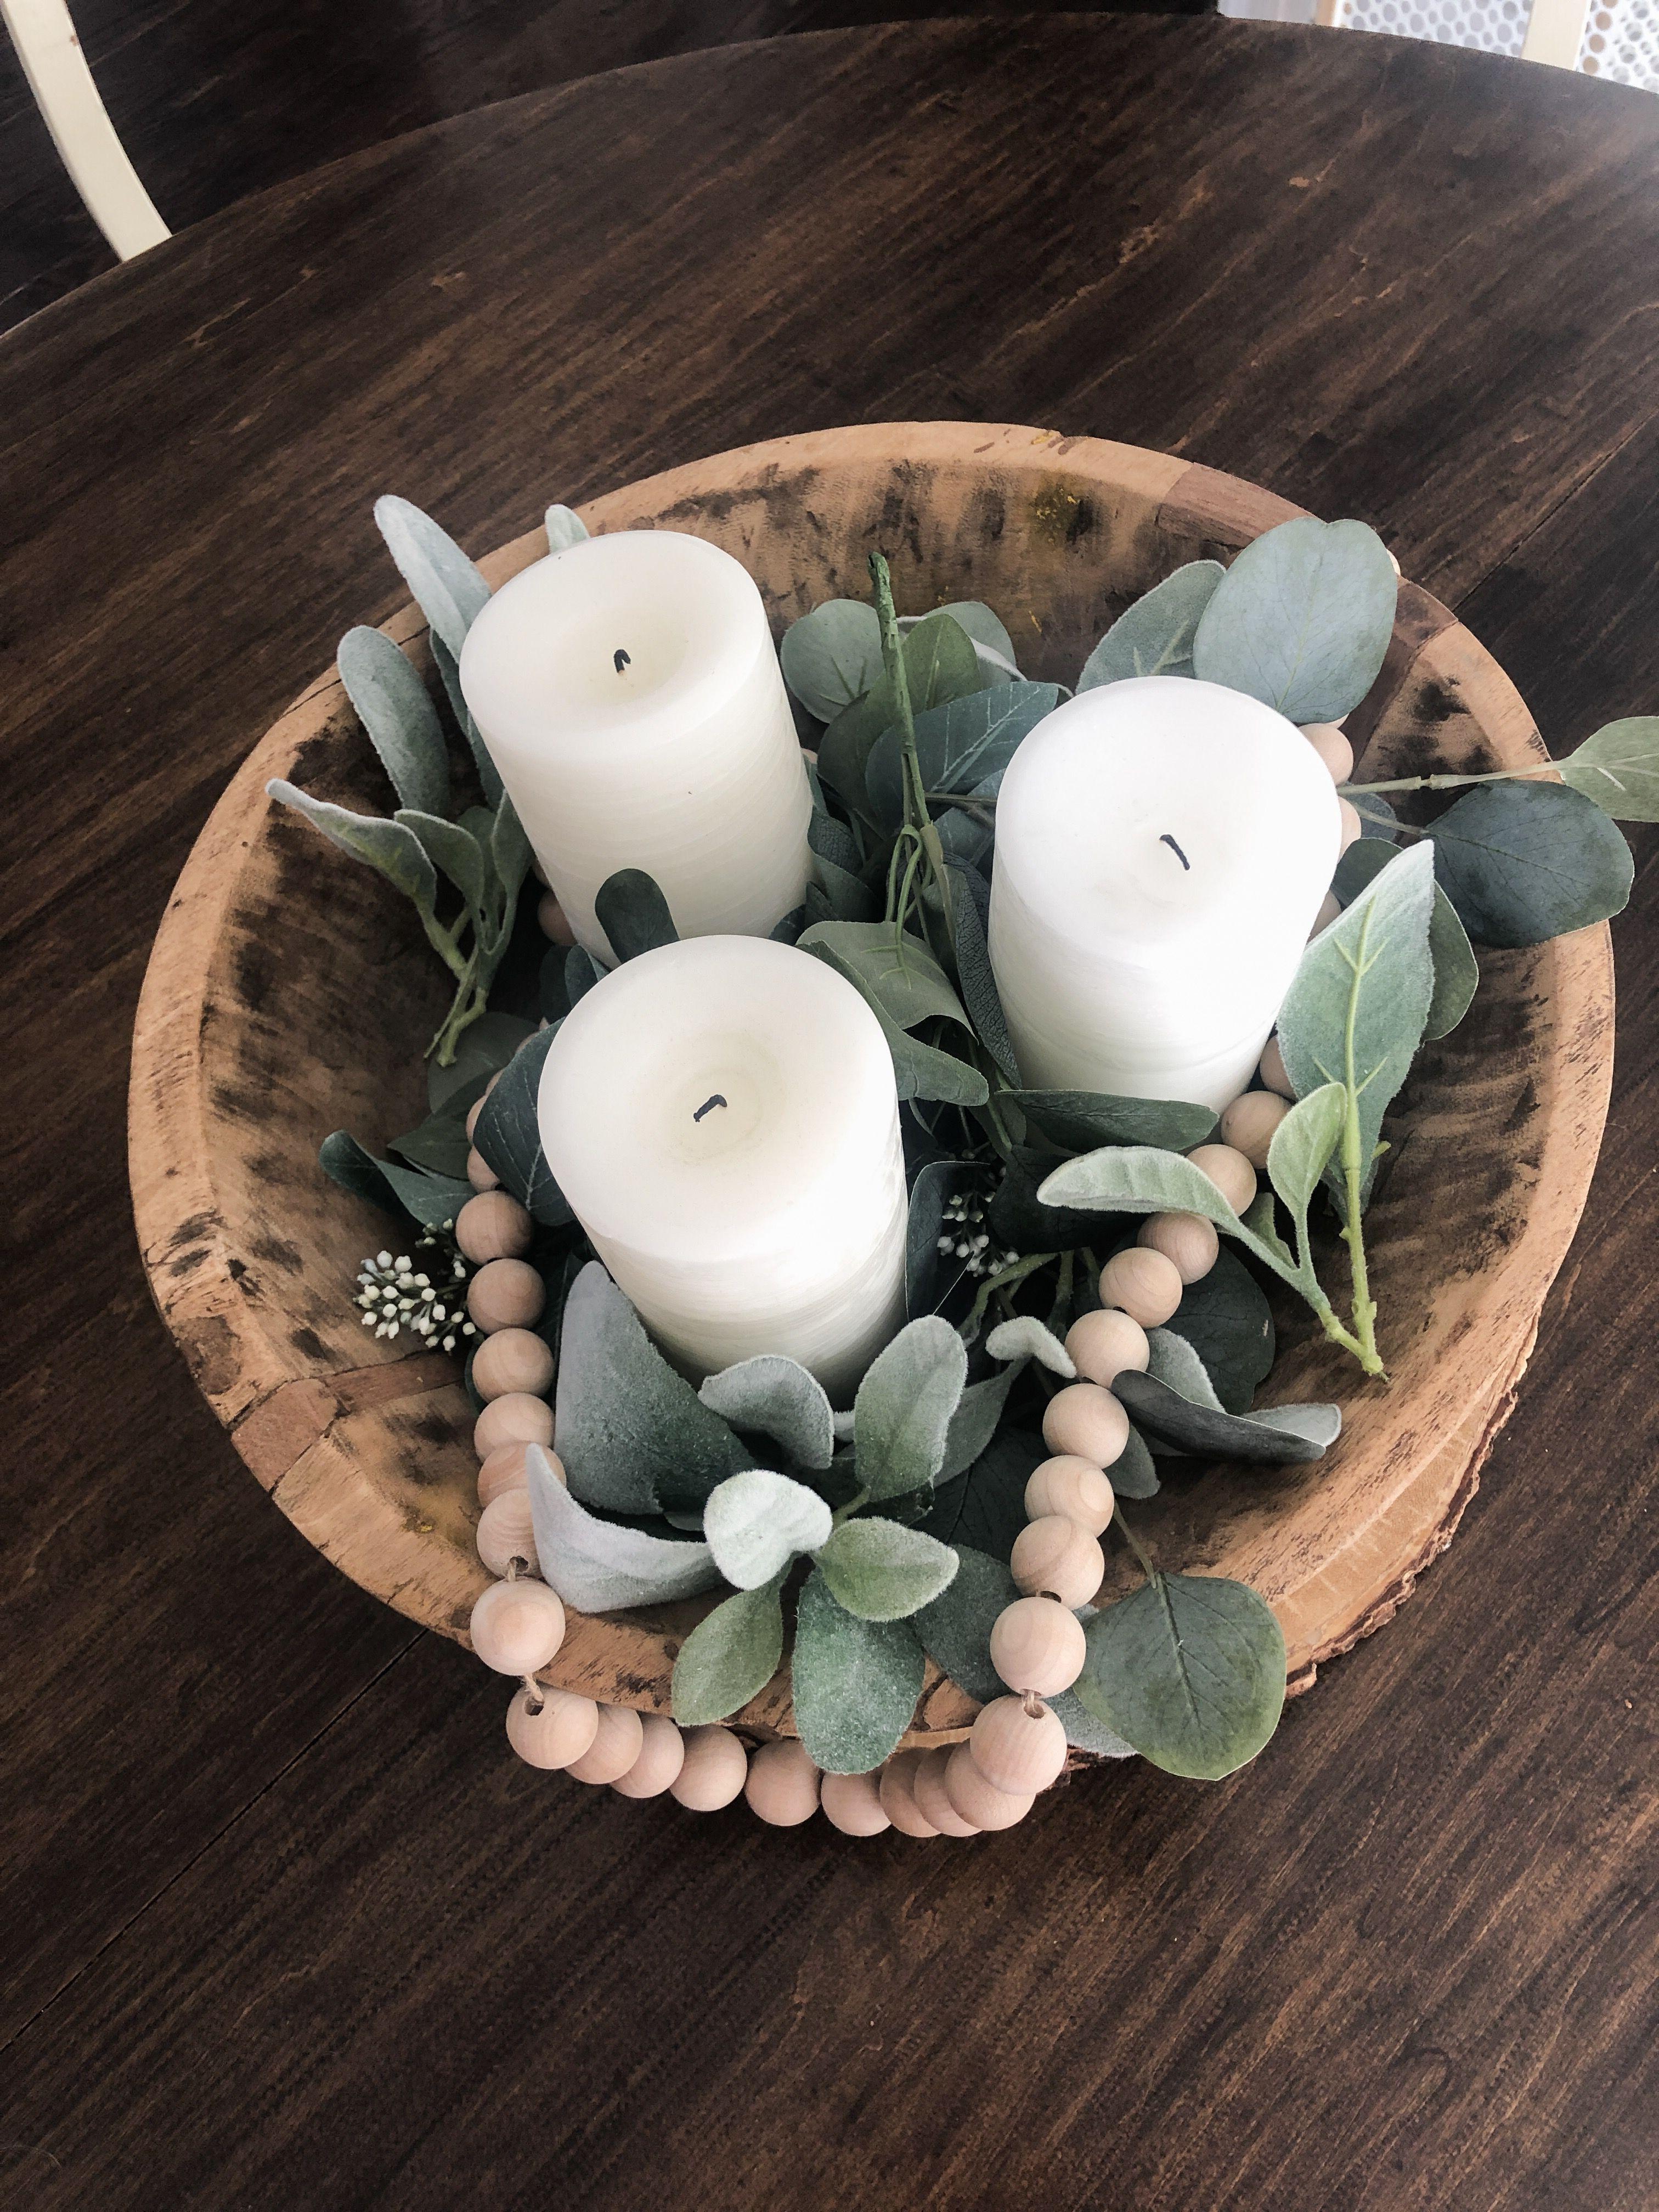 Centerpiece Dough Bowl Vintage Greenery Eucalyptus Lamb S Ear Wooden Beads Candles P Wood Bowl Decor Decorative Bowl Centerpiece Wood Bowl Centerpiece